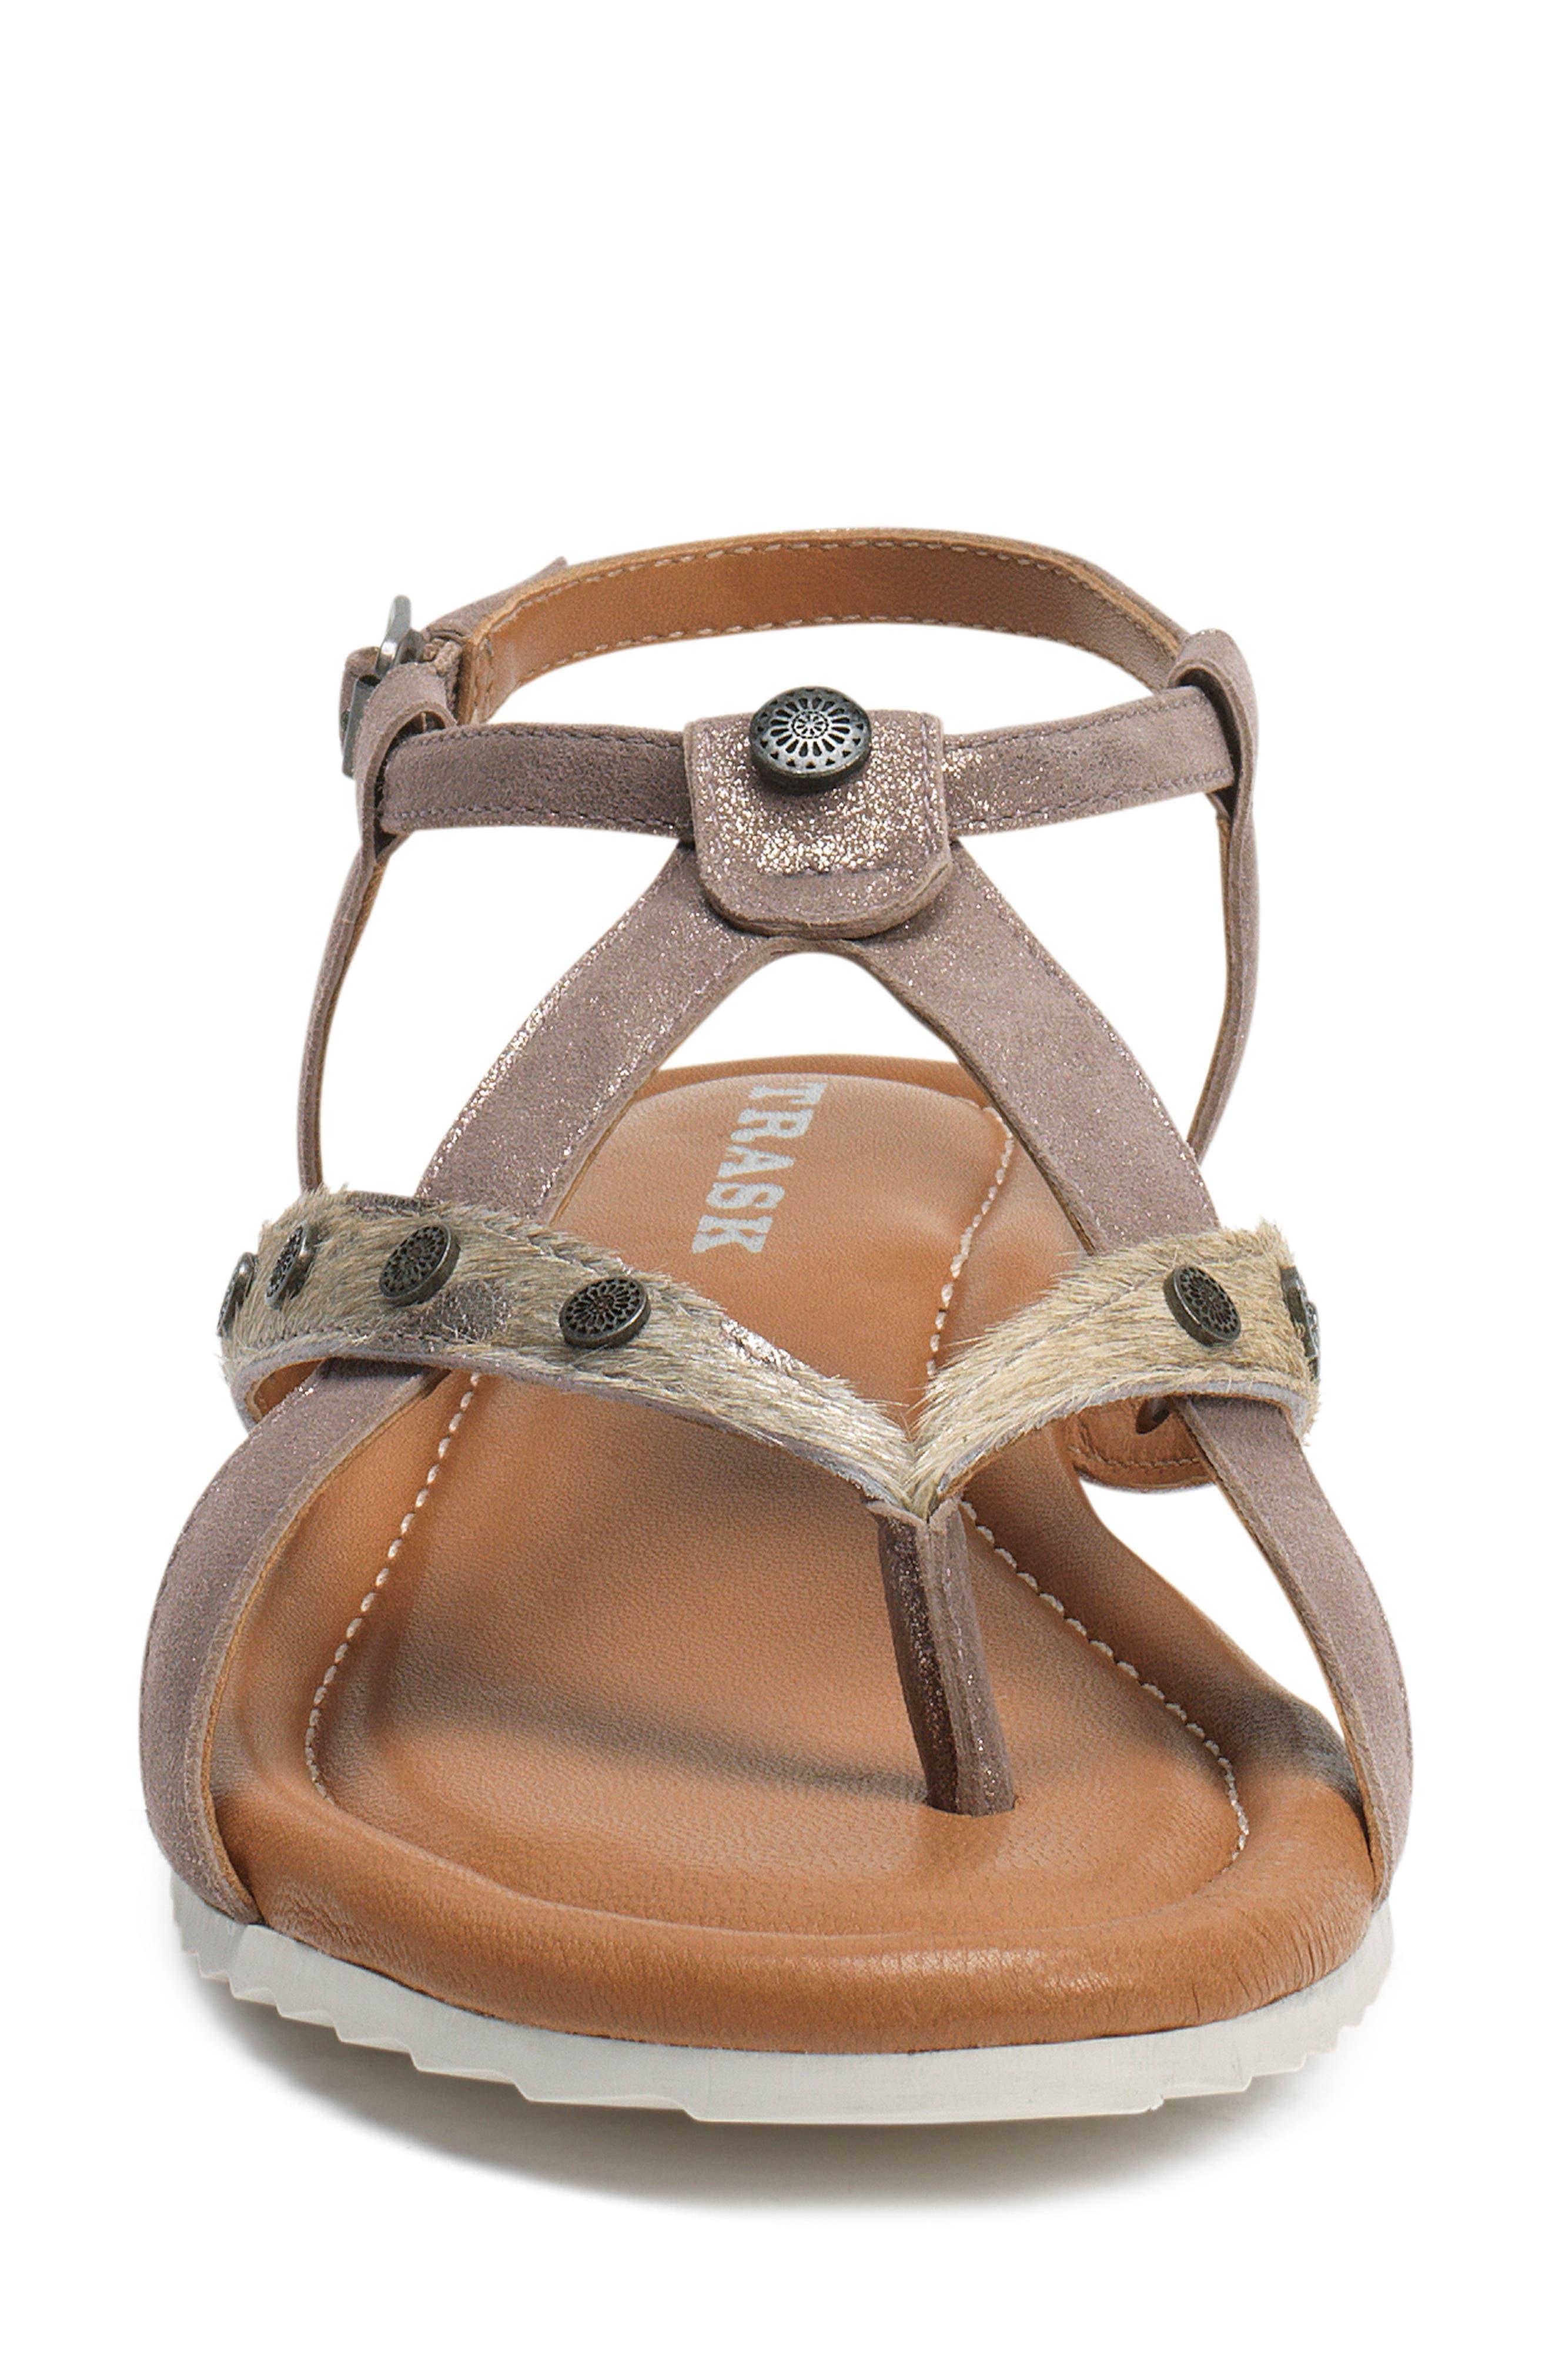 Shayla Water Resistant Sandal,                             Alternate thumbnail 4, color,                             PEWTER/ BONE SUEDE